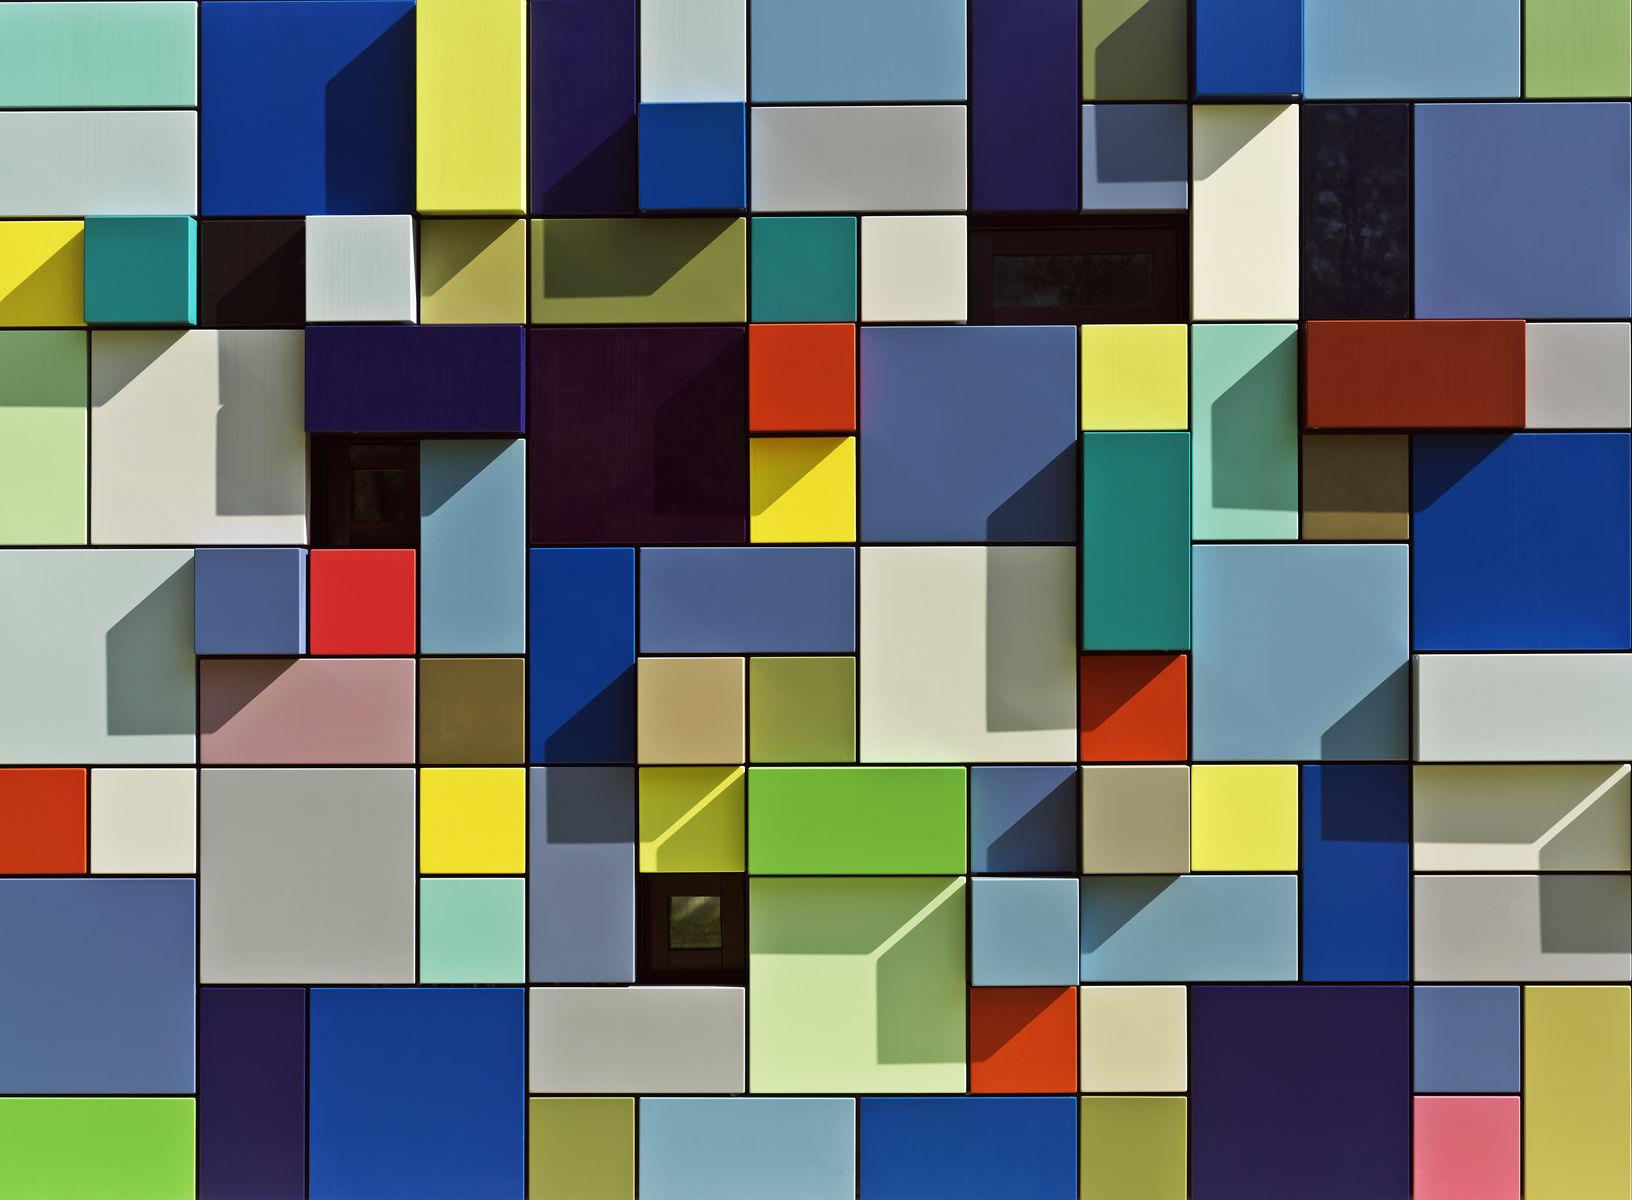 1_0_348_1colour_patterns_13969b.jpg